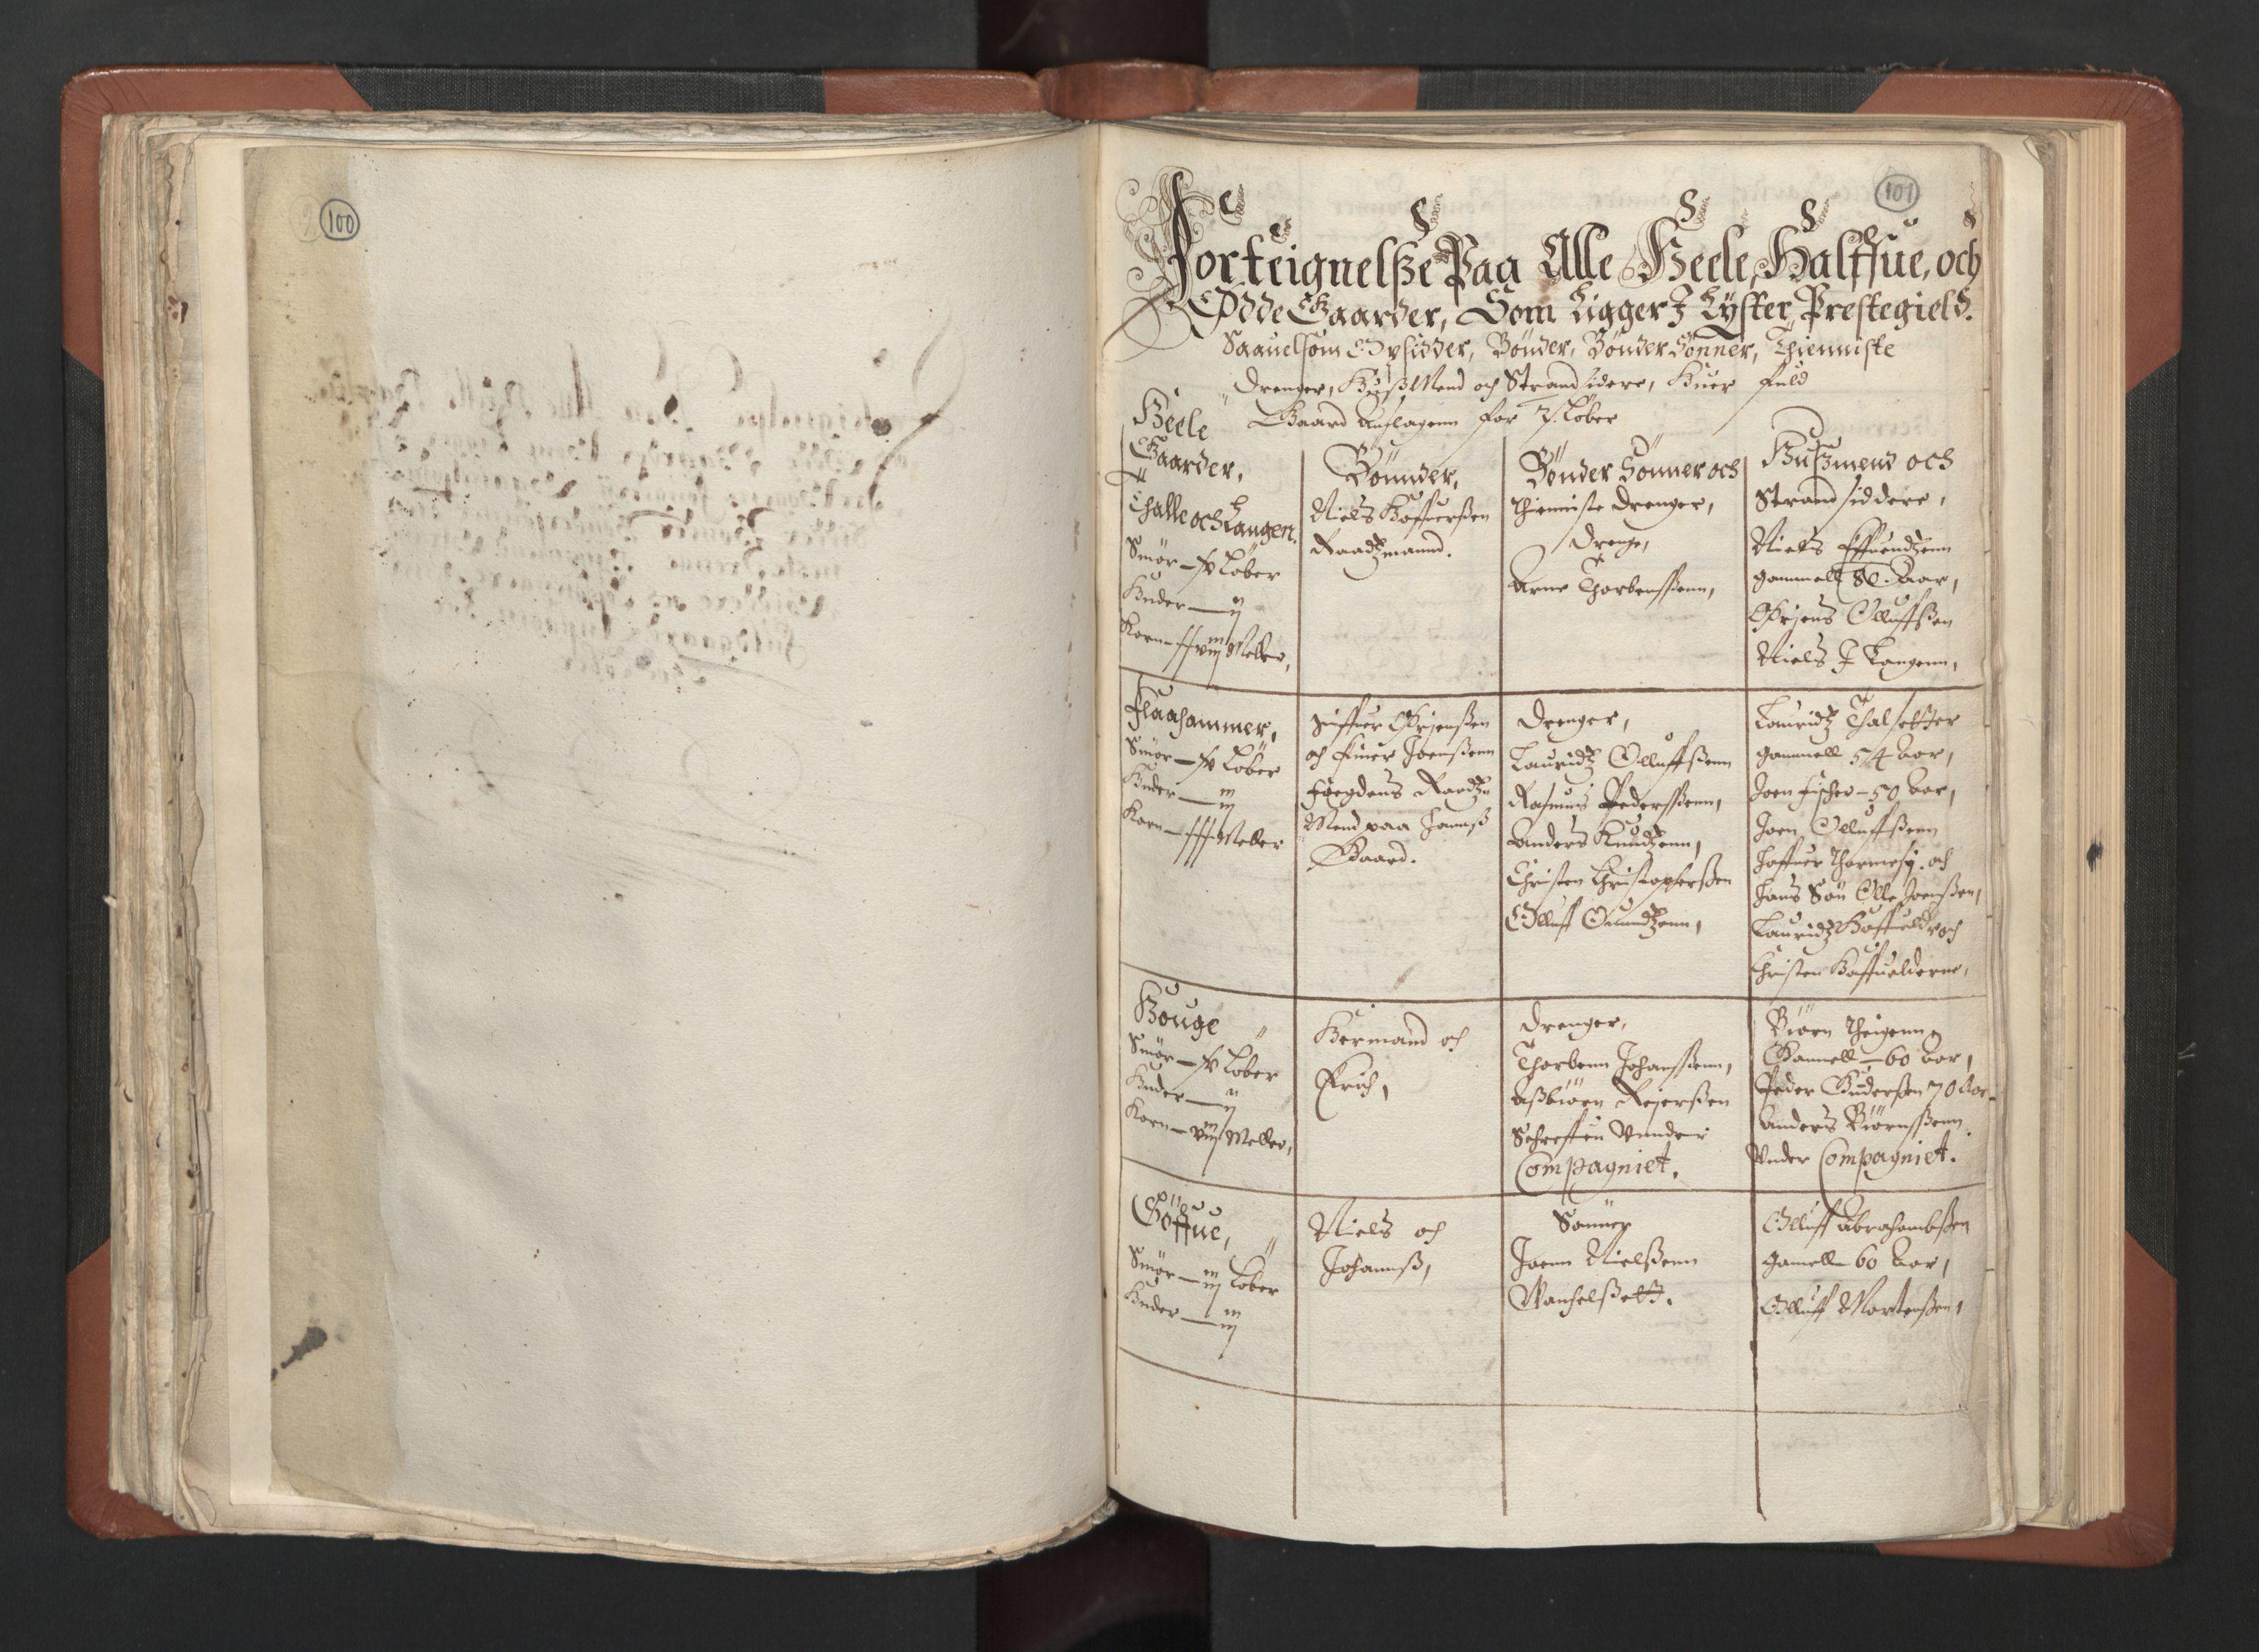 RA, Fogdenes og sorenskrivernes manntall 1664-1666, nr. 14: Hardanger len, Ytre Sogn fogderi og Indre Sogn fogderi, 1664-1665, s. 100-101